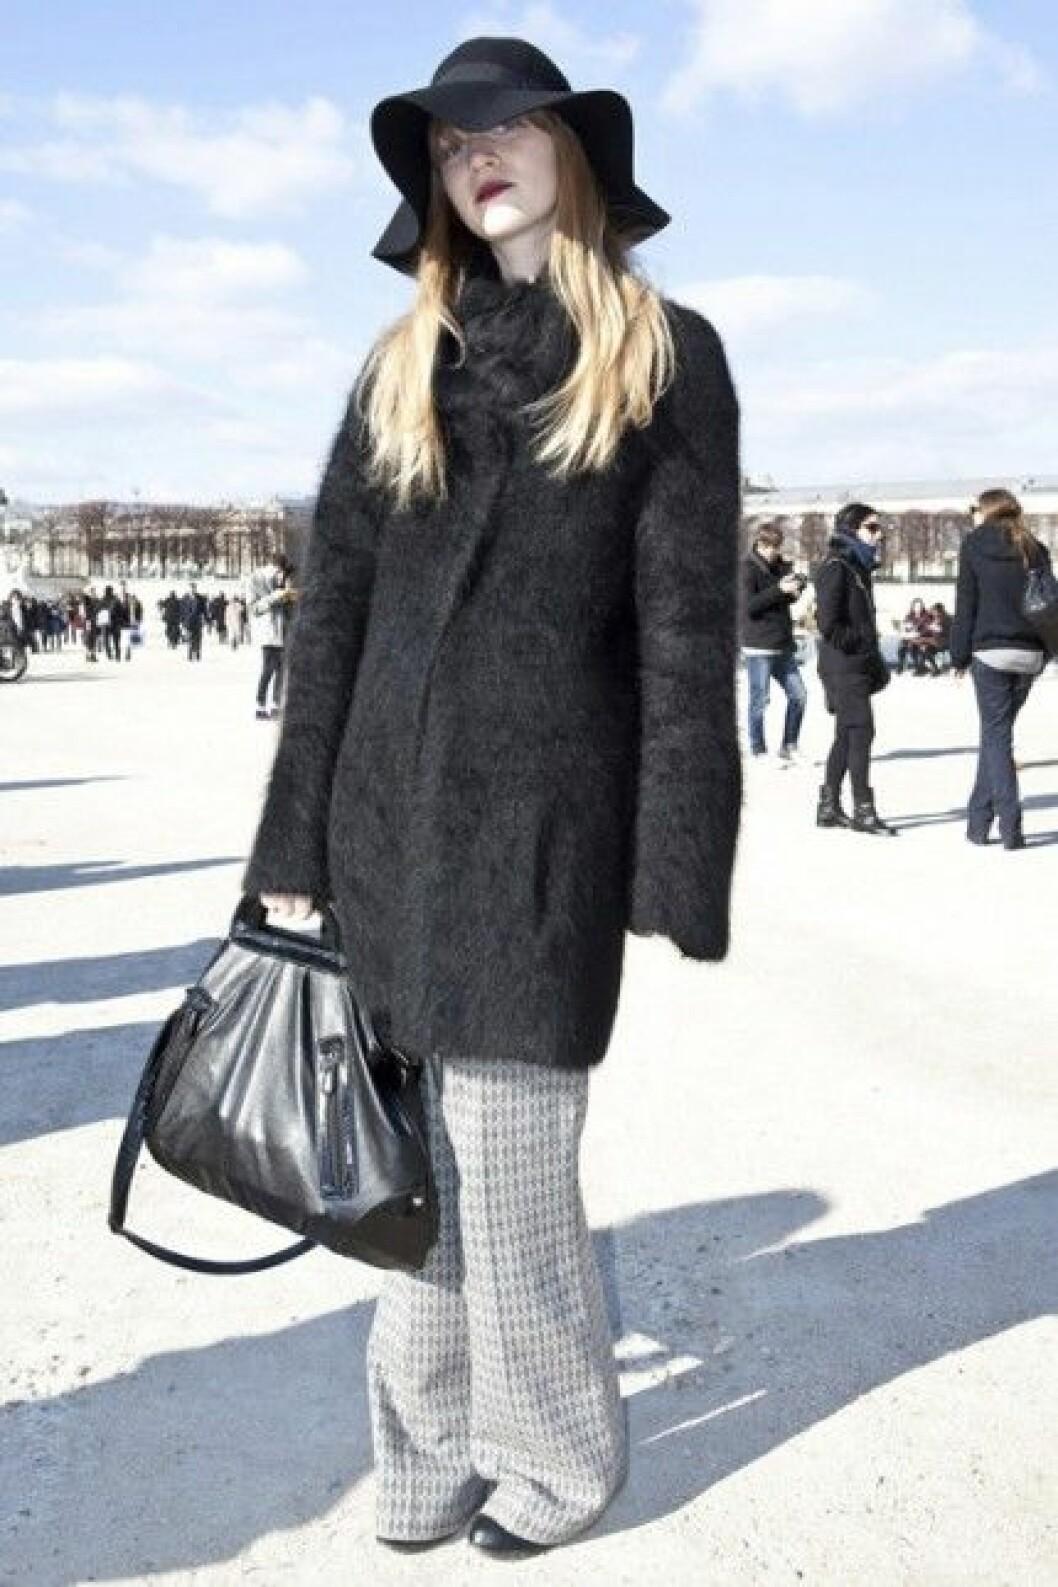 Hatt under Paris Fashion Week, A/W 2010.